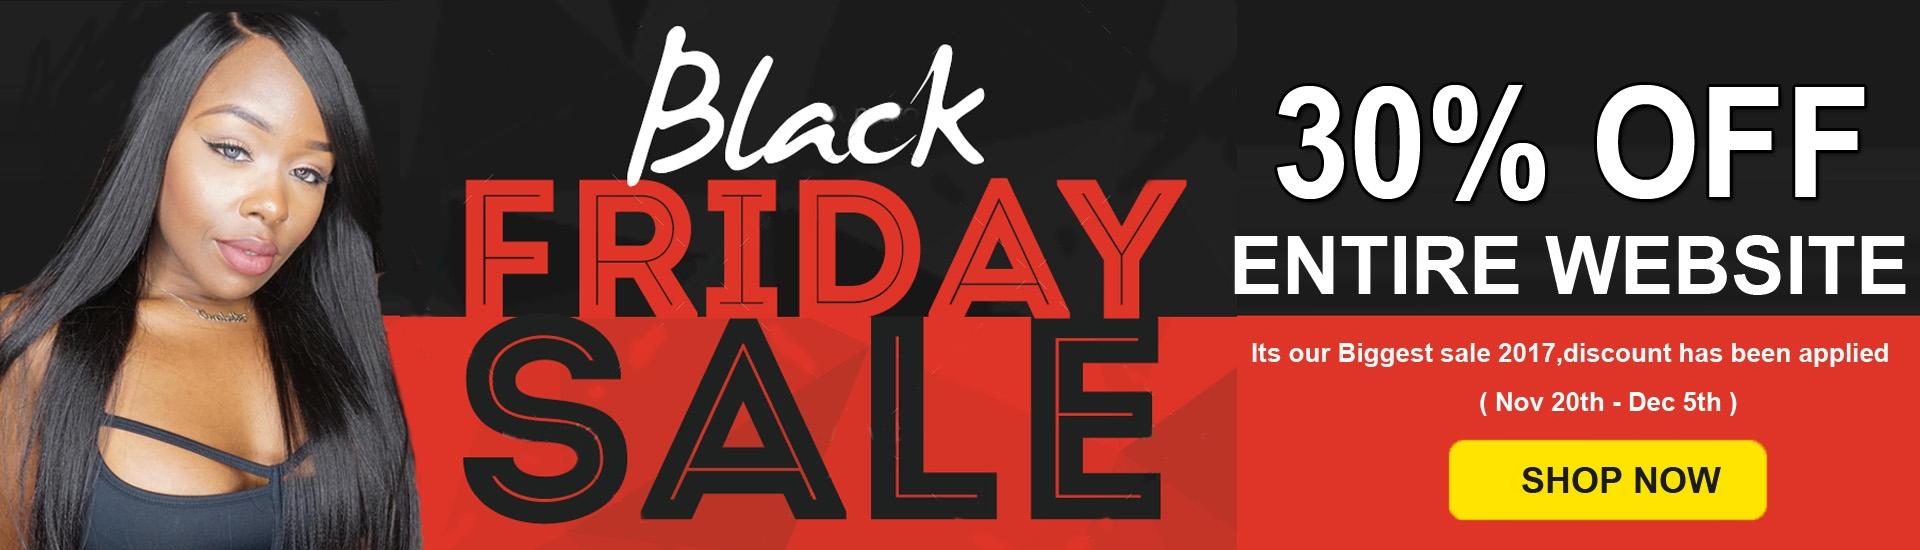 2017 Black Friday Sale